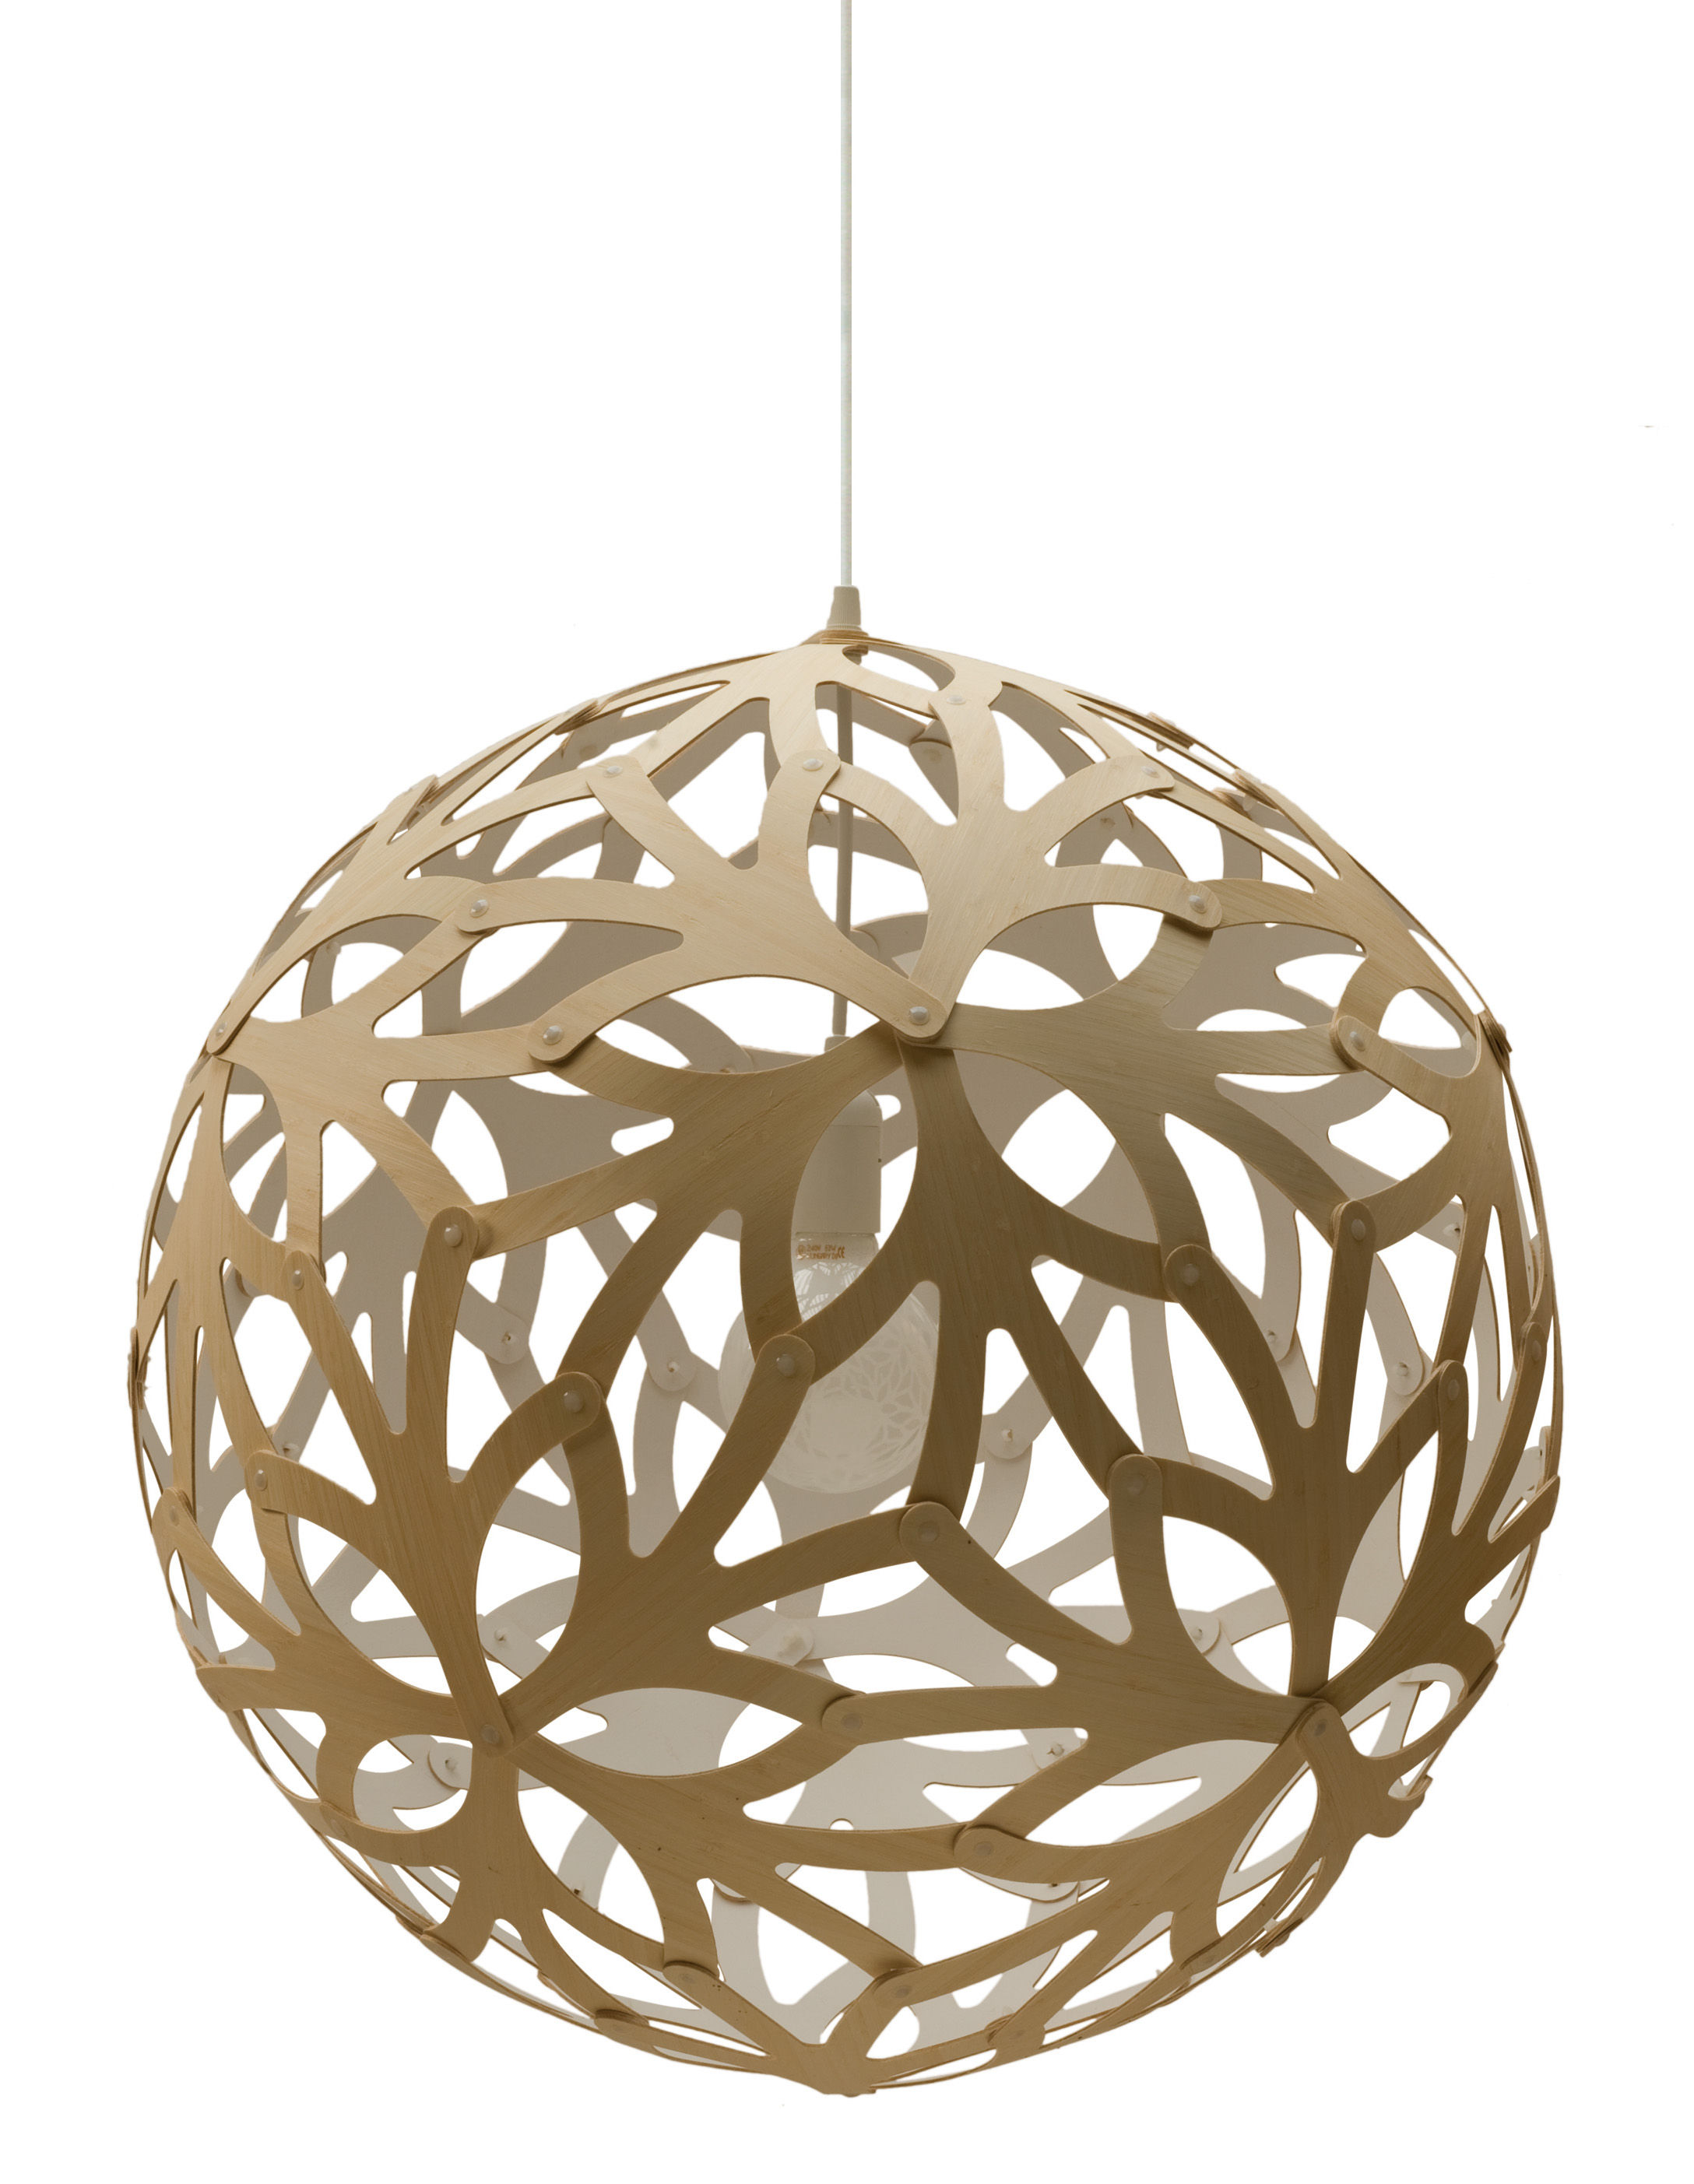 Luminaire - Suspensions - Suspension Floral / Ø 40 cm - Bicolore blanc & bois - David Trubridge - Blanc / Bois naturel - Pin